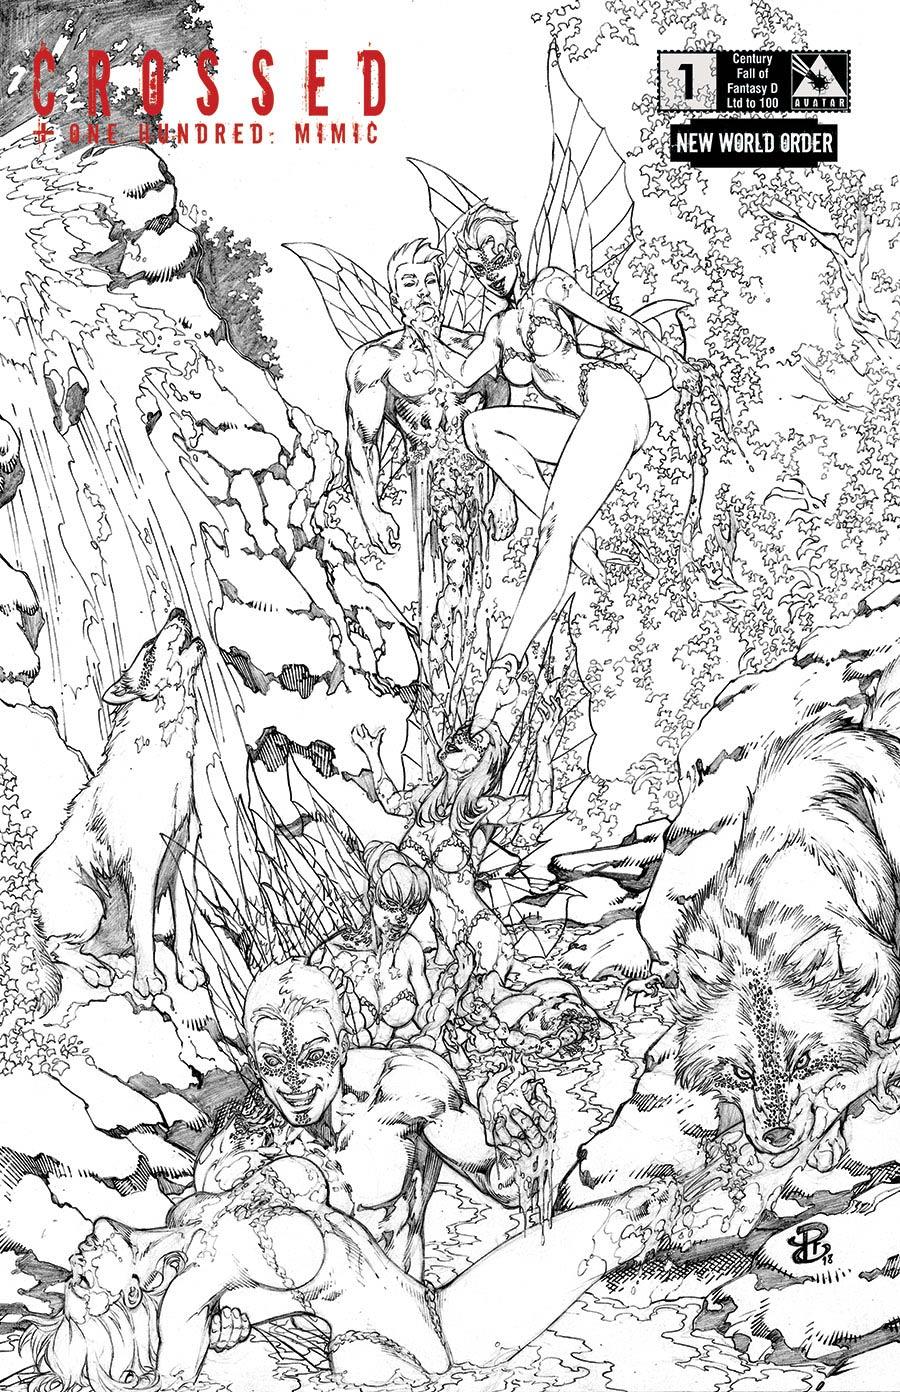 Crossed Plus 100 Mimic #1 Cover P NWO Century Fall Of Fantasy D Cover